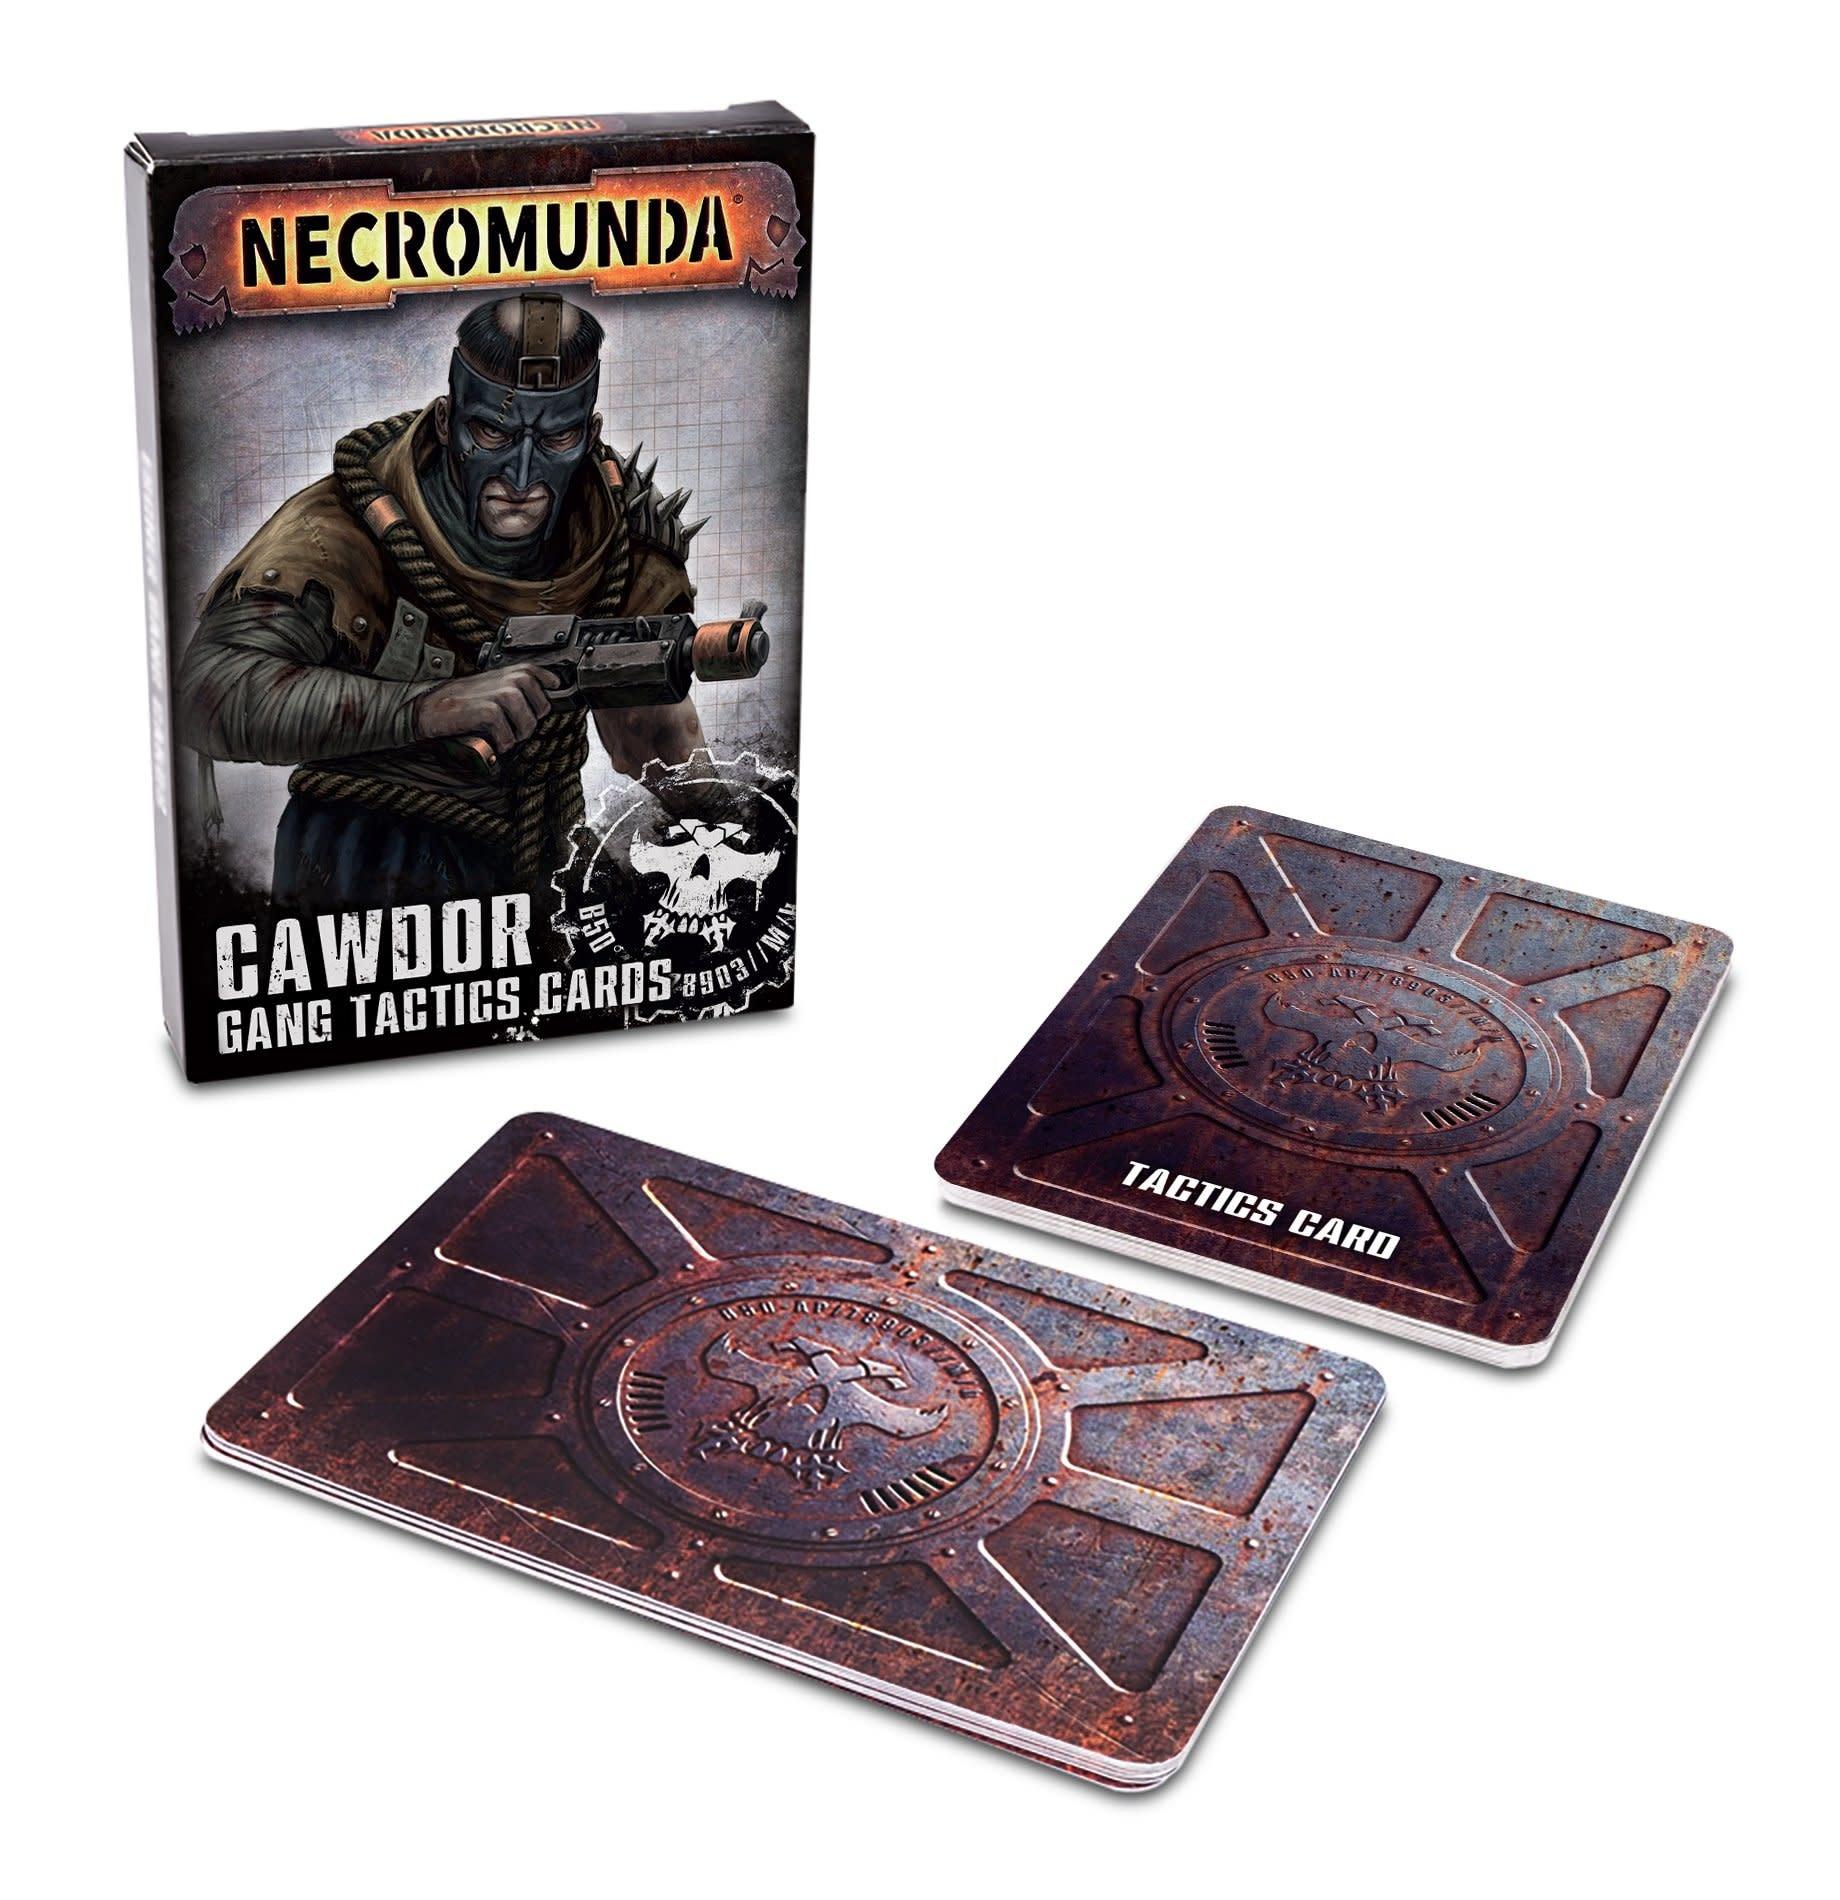 Games-Workshop Necromunda: Cawdor Gang Tactics Cards